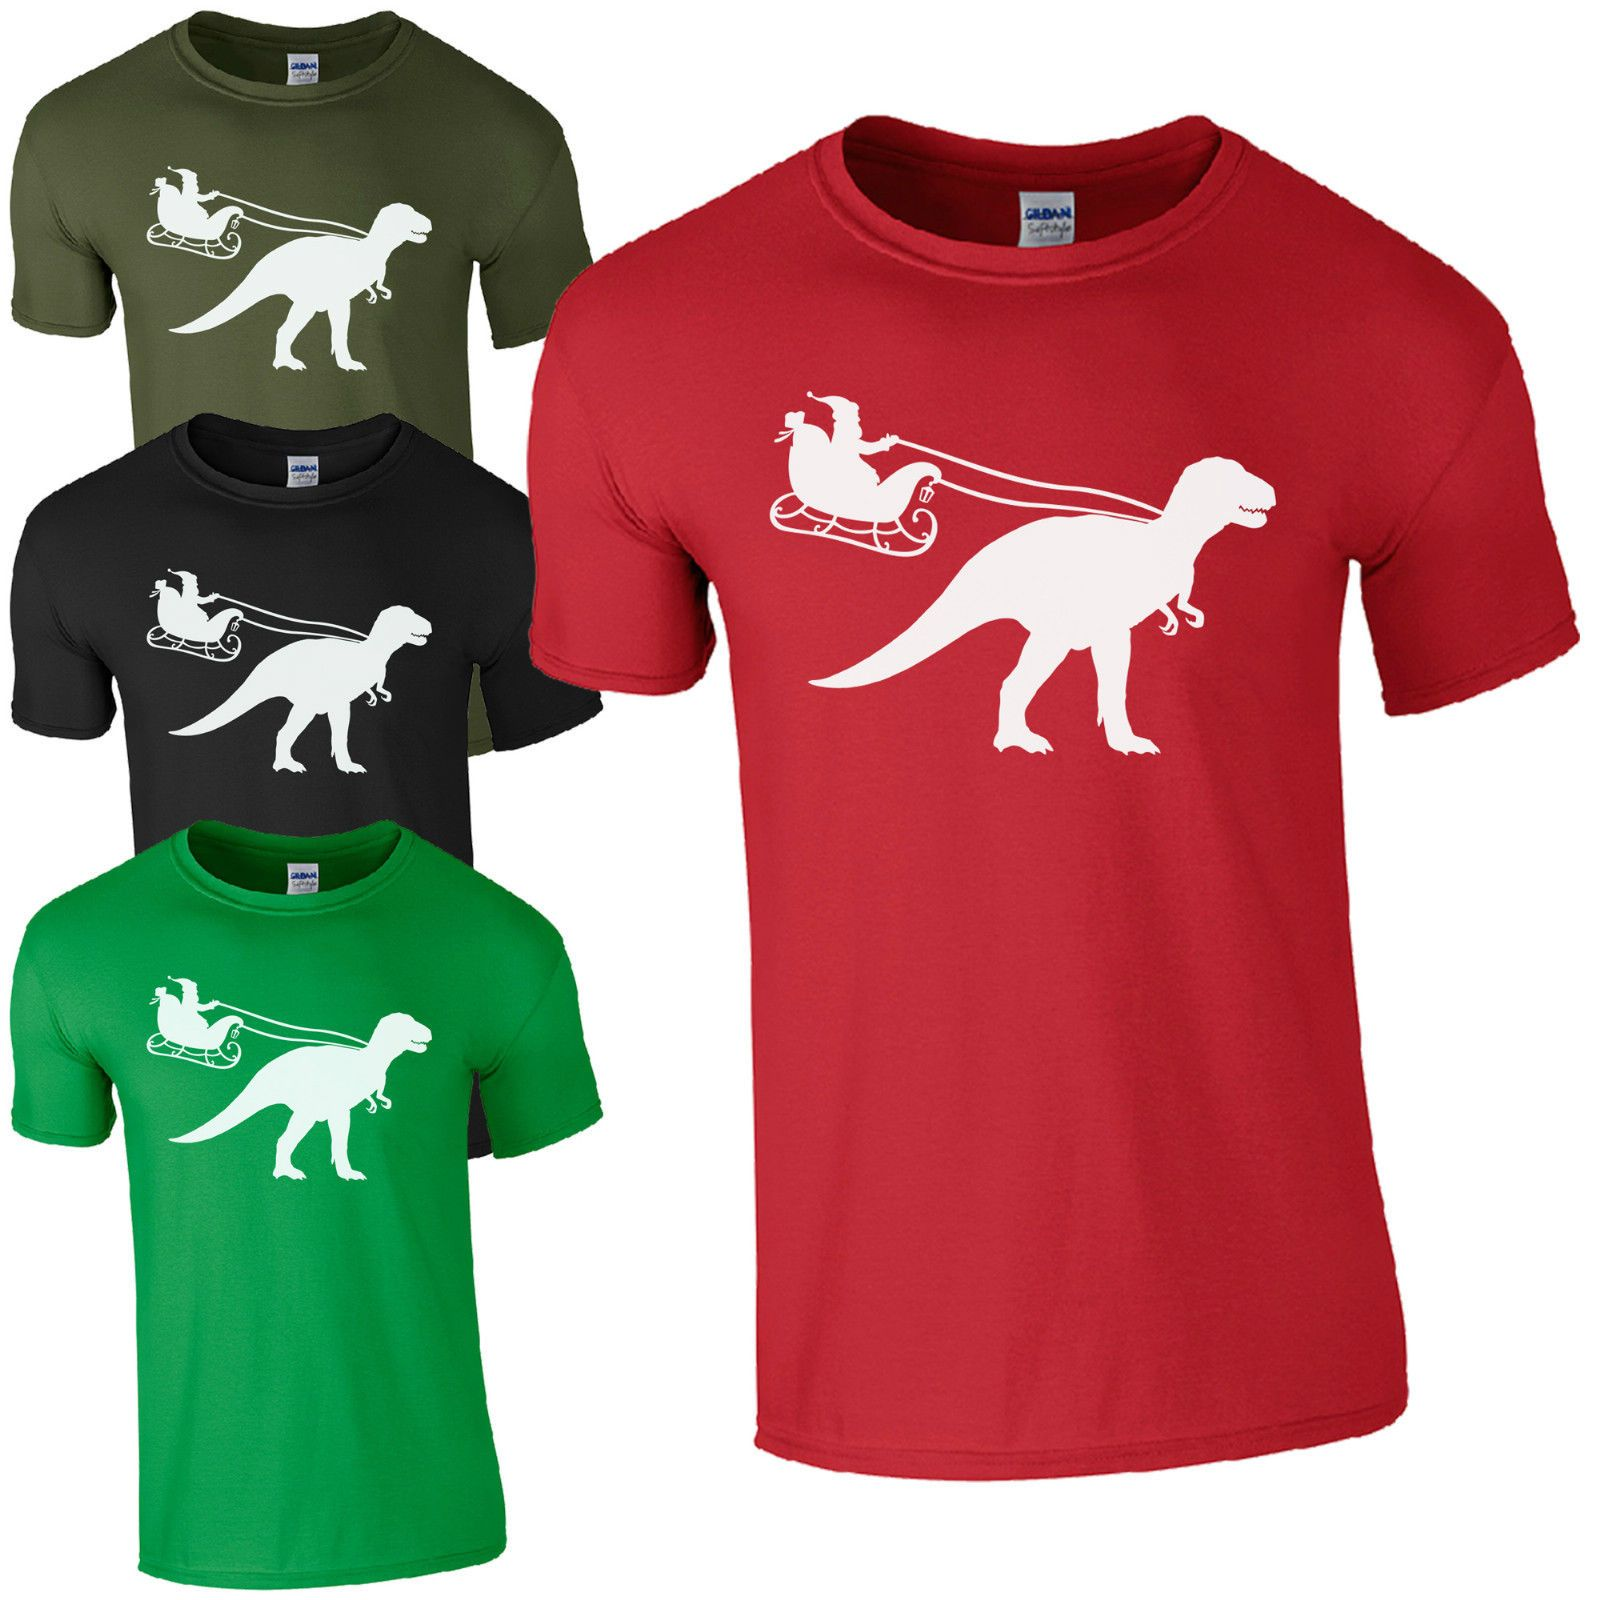 56185af4 ... Dinosaur T-Shirt Funny T-Rex Jurassic Christmas Gift Kids Mens Top  variant attributes variant attributes. variant attributes. Stock Status :  In Stock